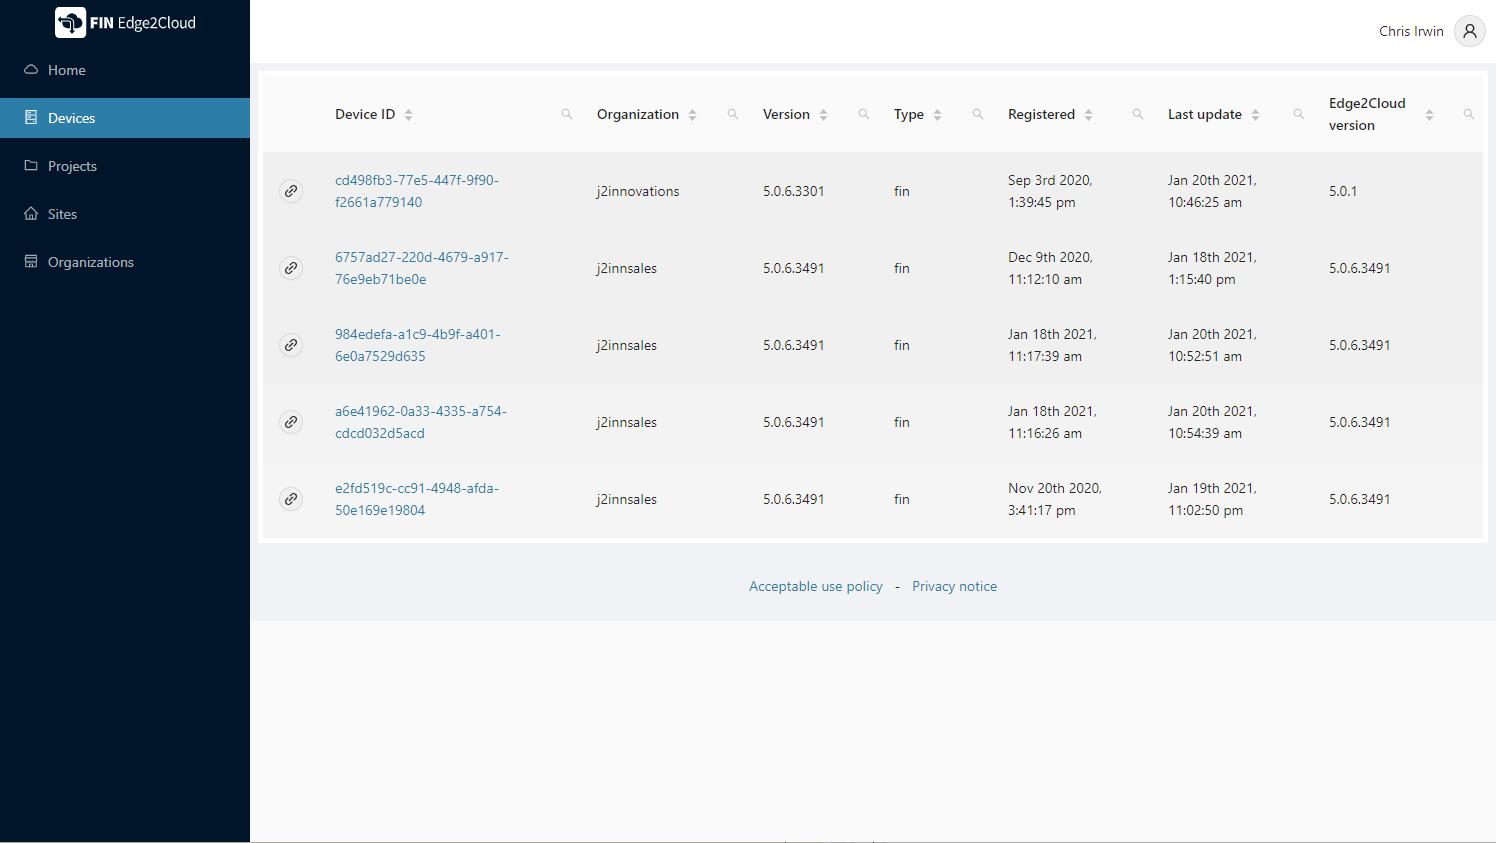 Edge2Cloud Portal